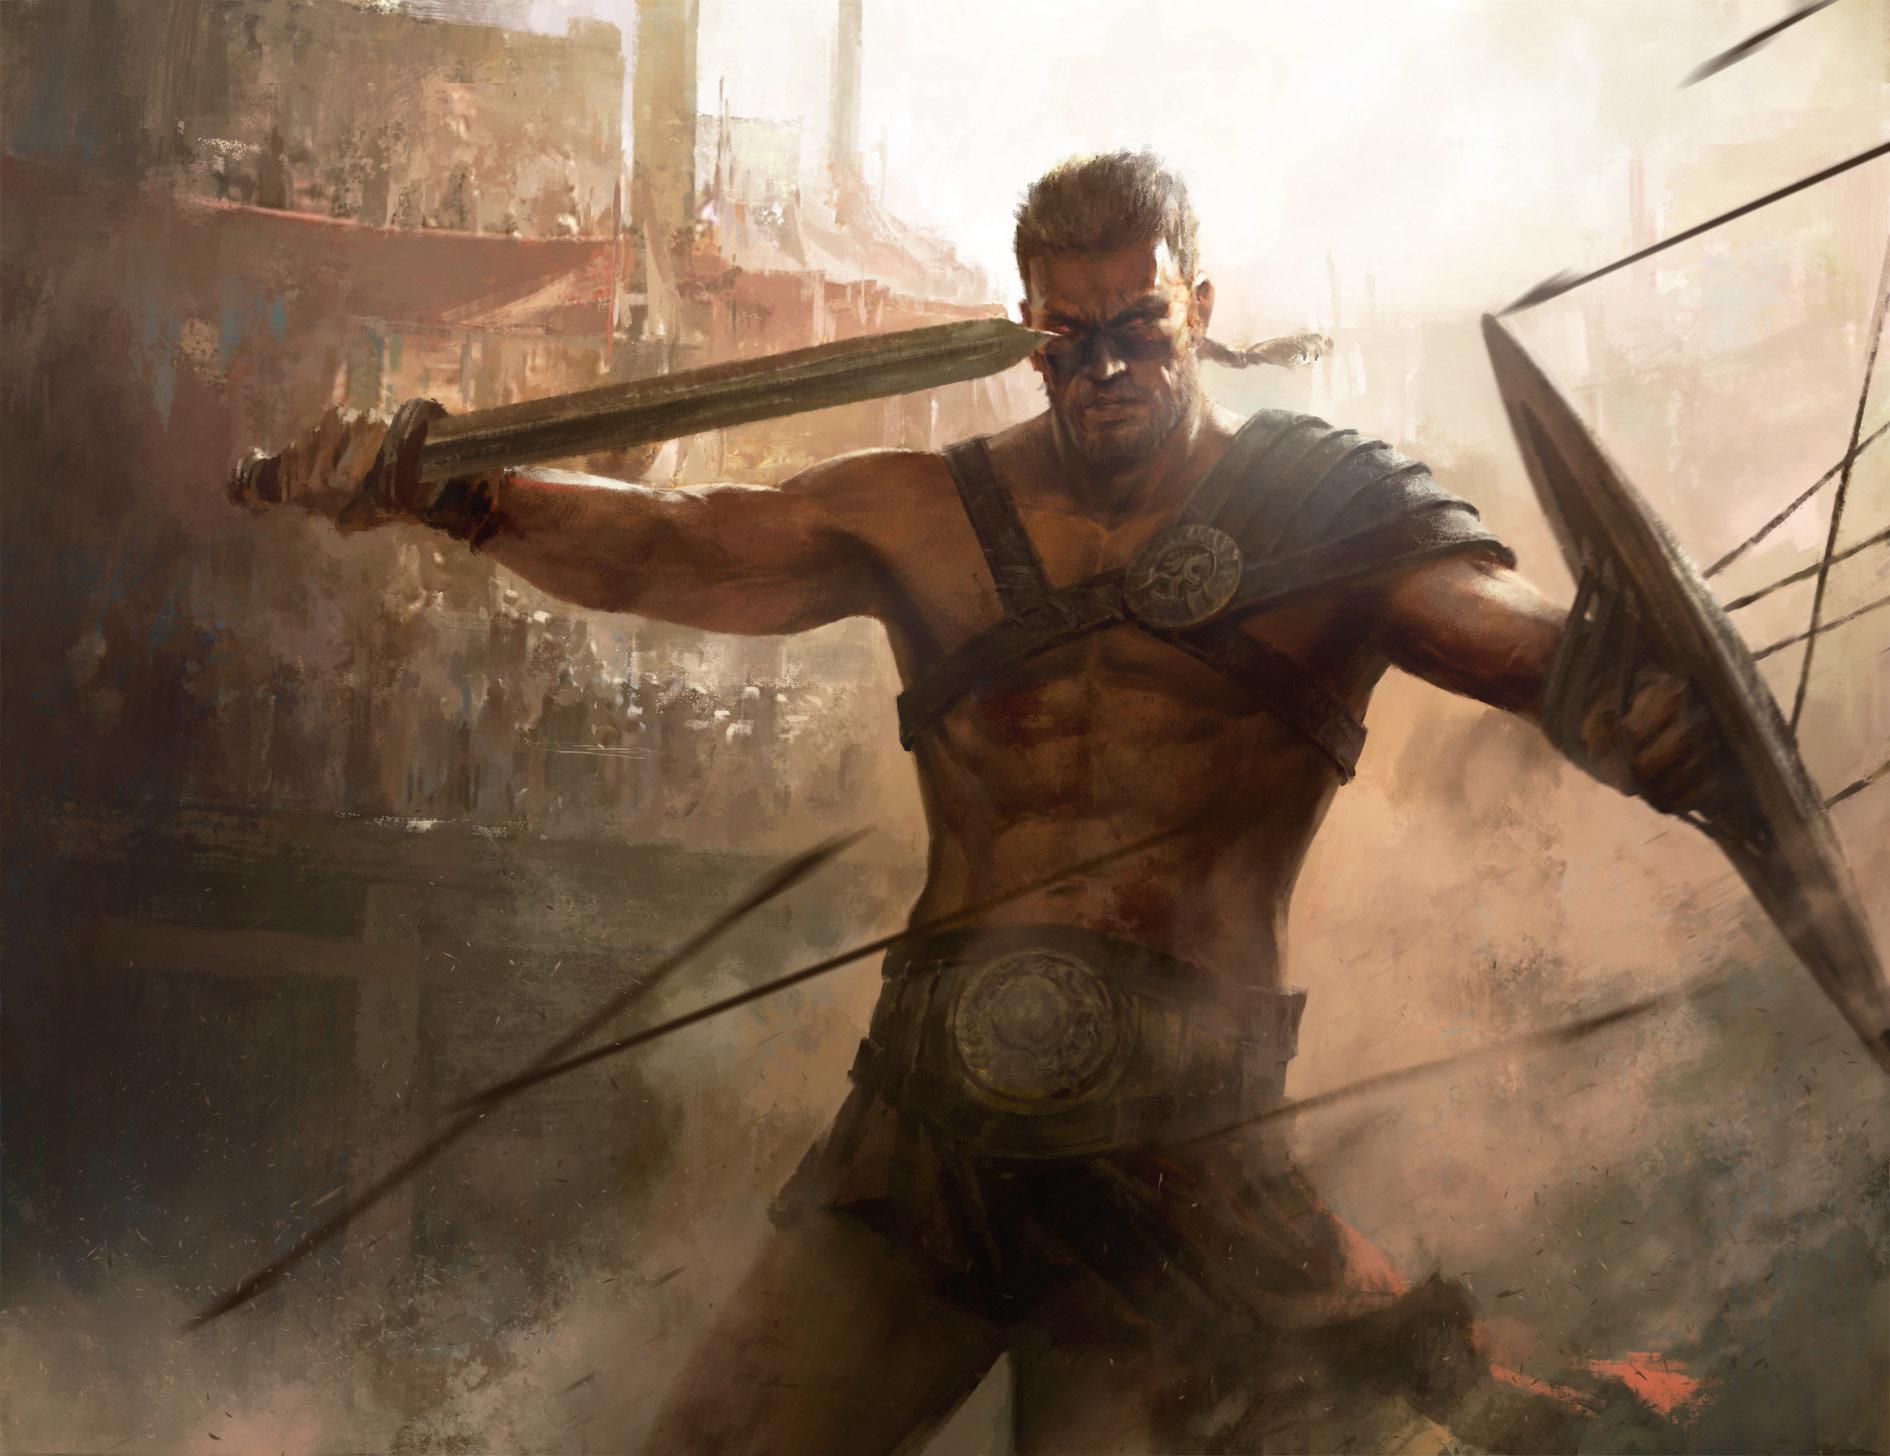 Artstation - Gladiator, Mazert Young-2289